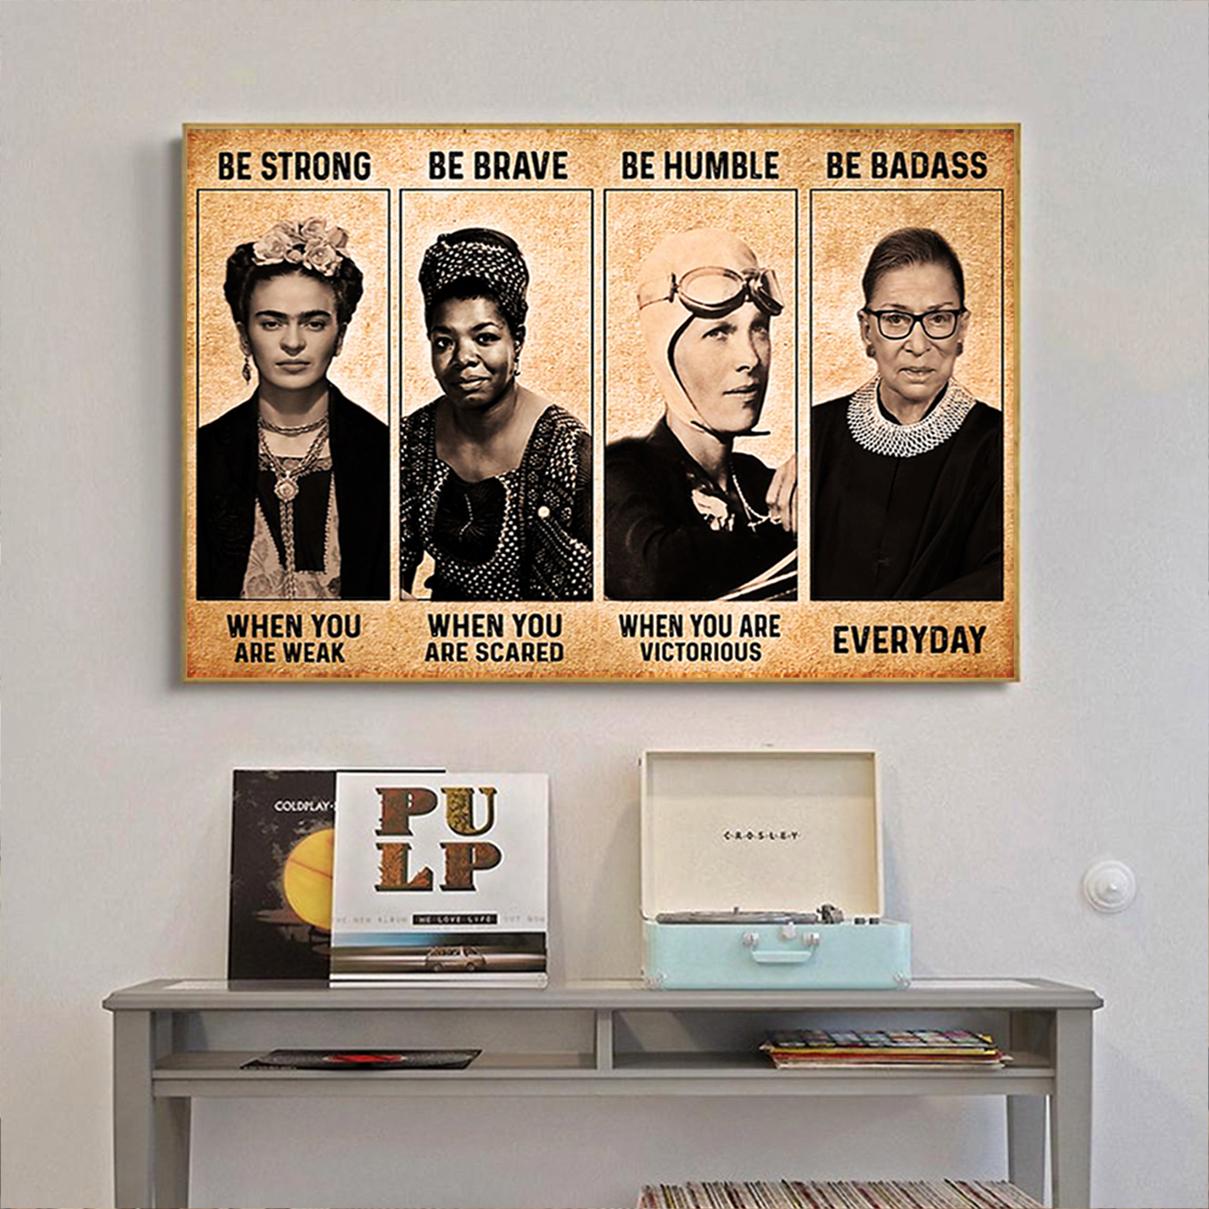 Frida Kahlo Maya Angelou Amelia Earhart Ruth Bader Ginsburg Feminist Be strong be brave poster A3